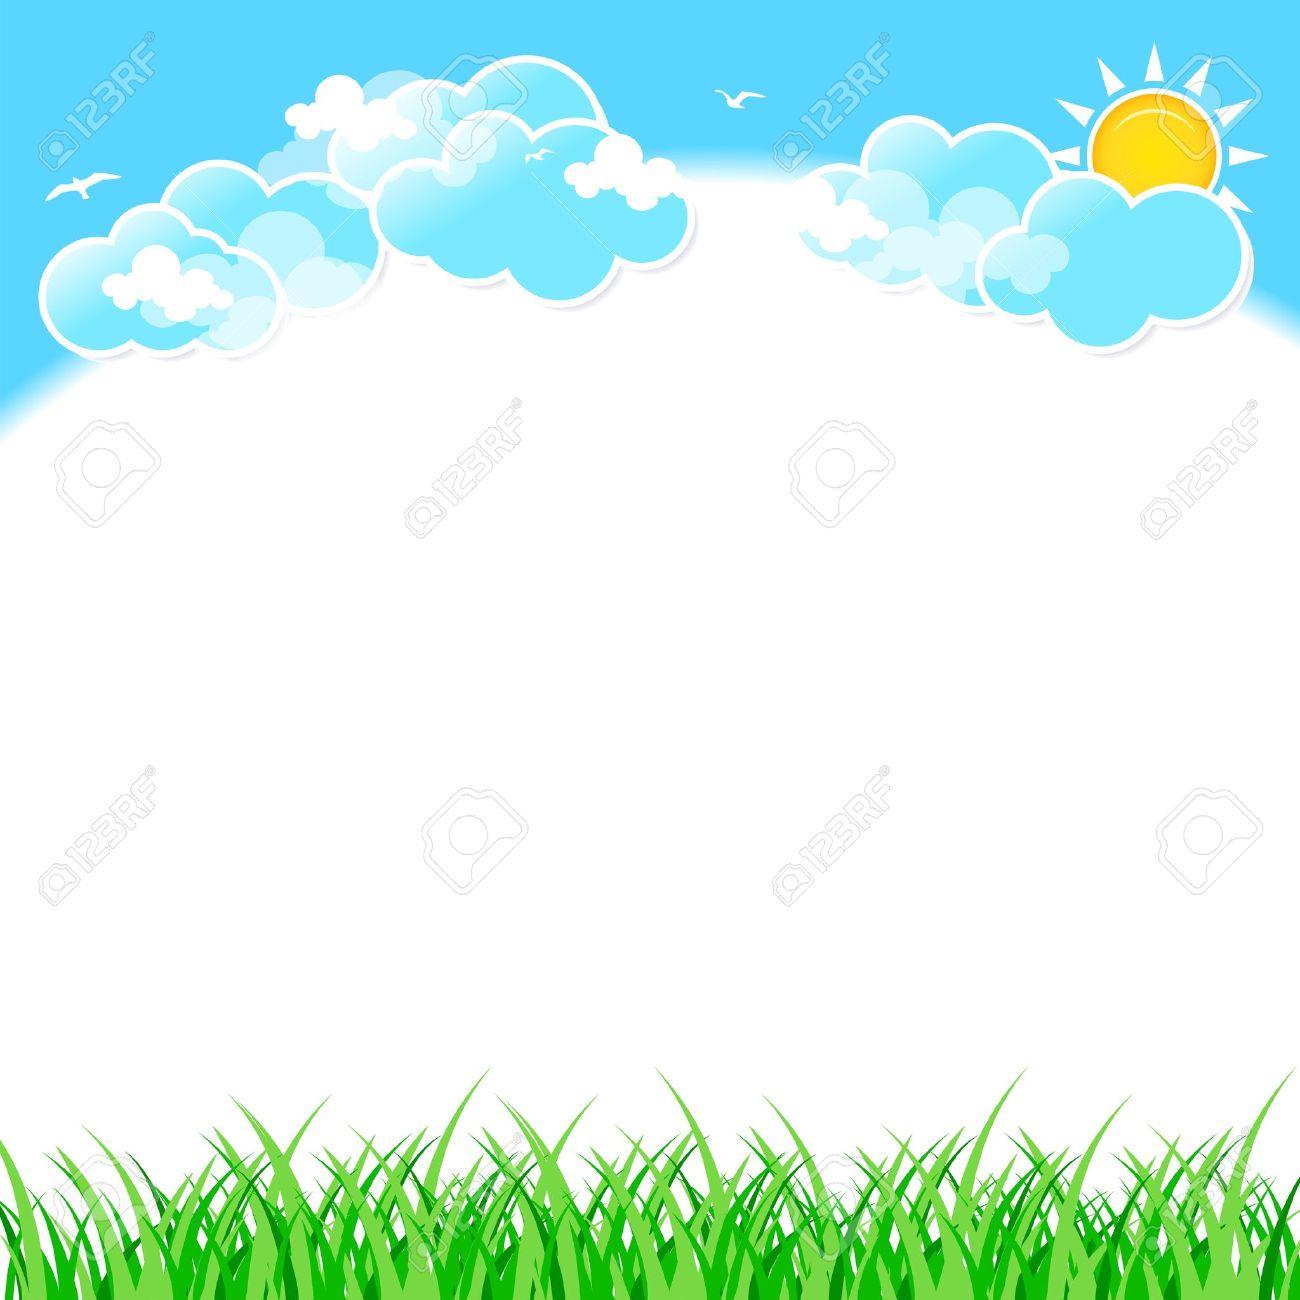 Outside clipart grass sky Sky%20clipart Sky Free Clip Art